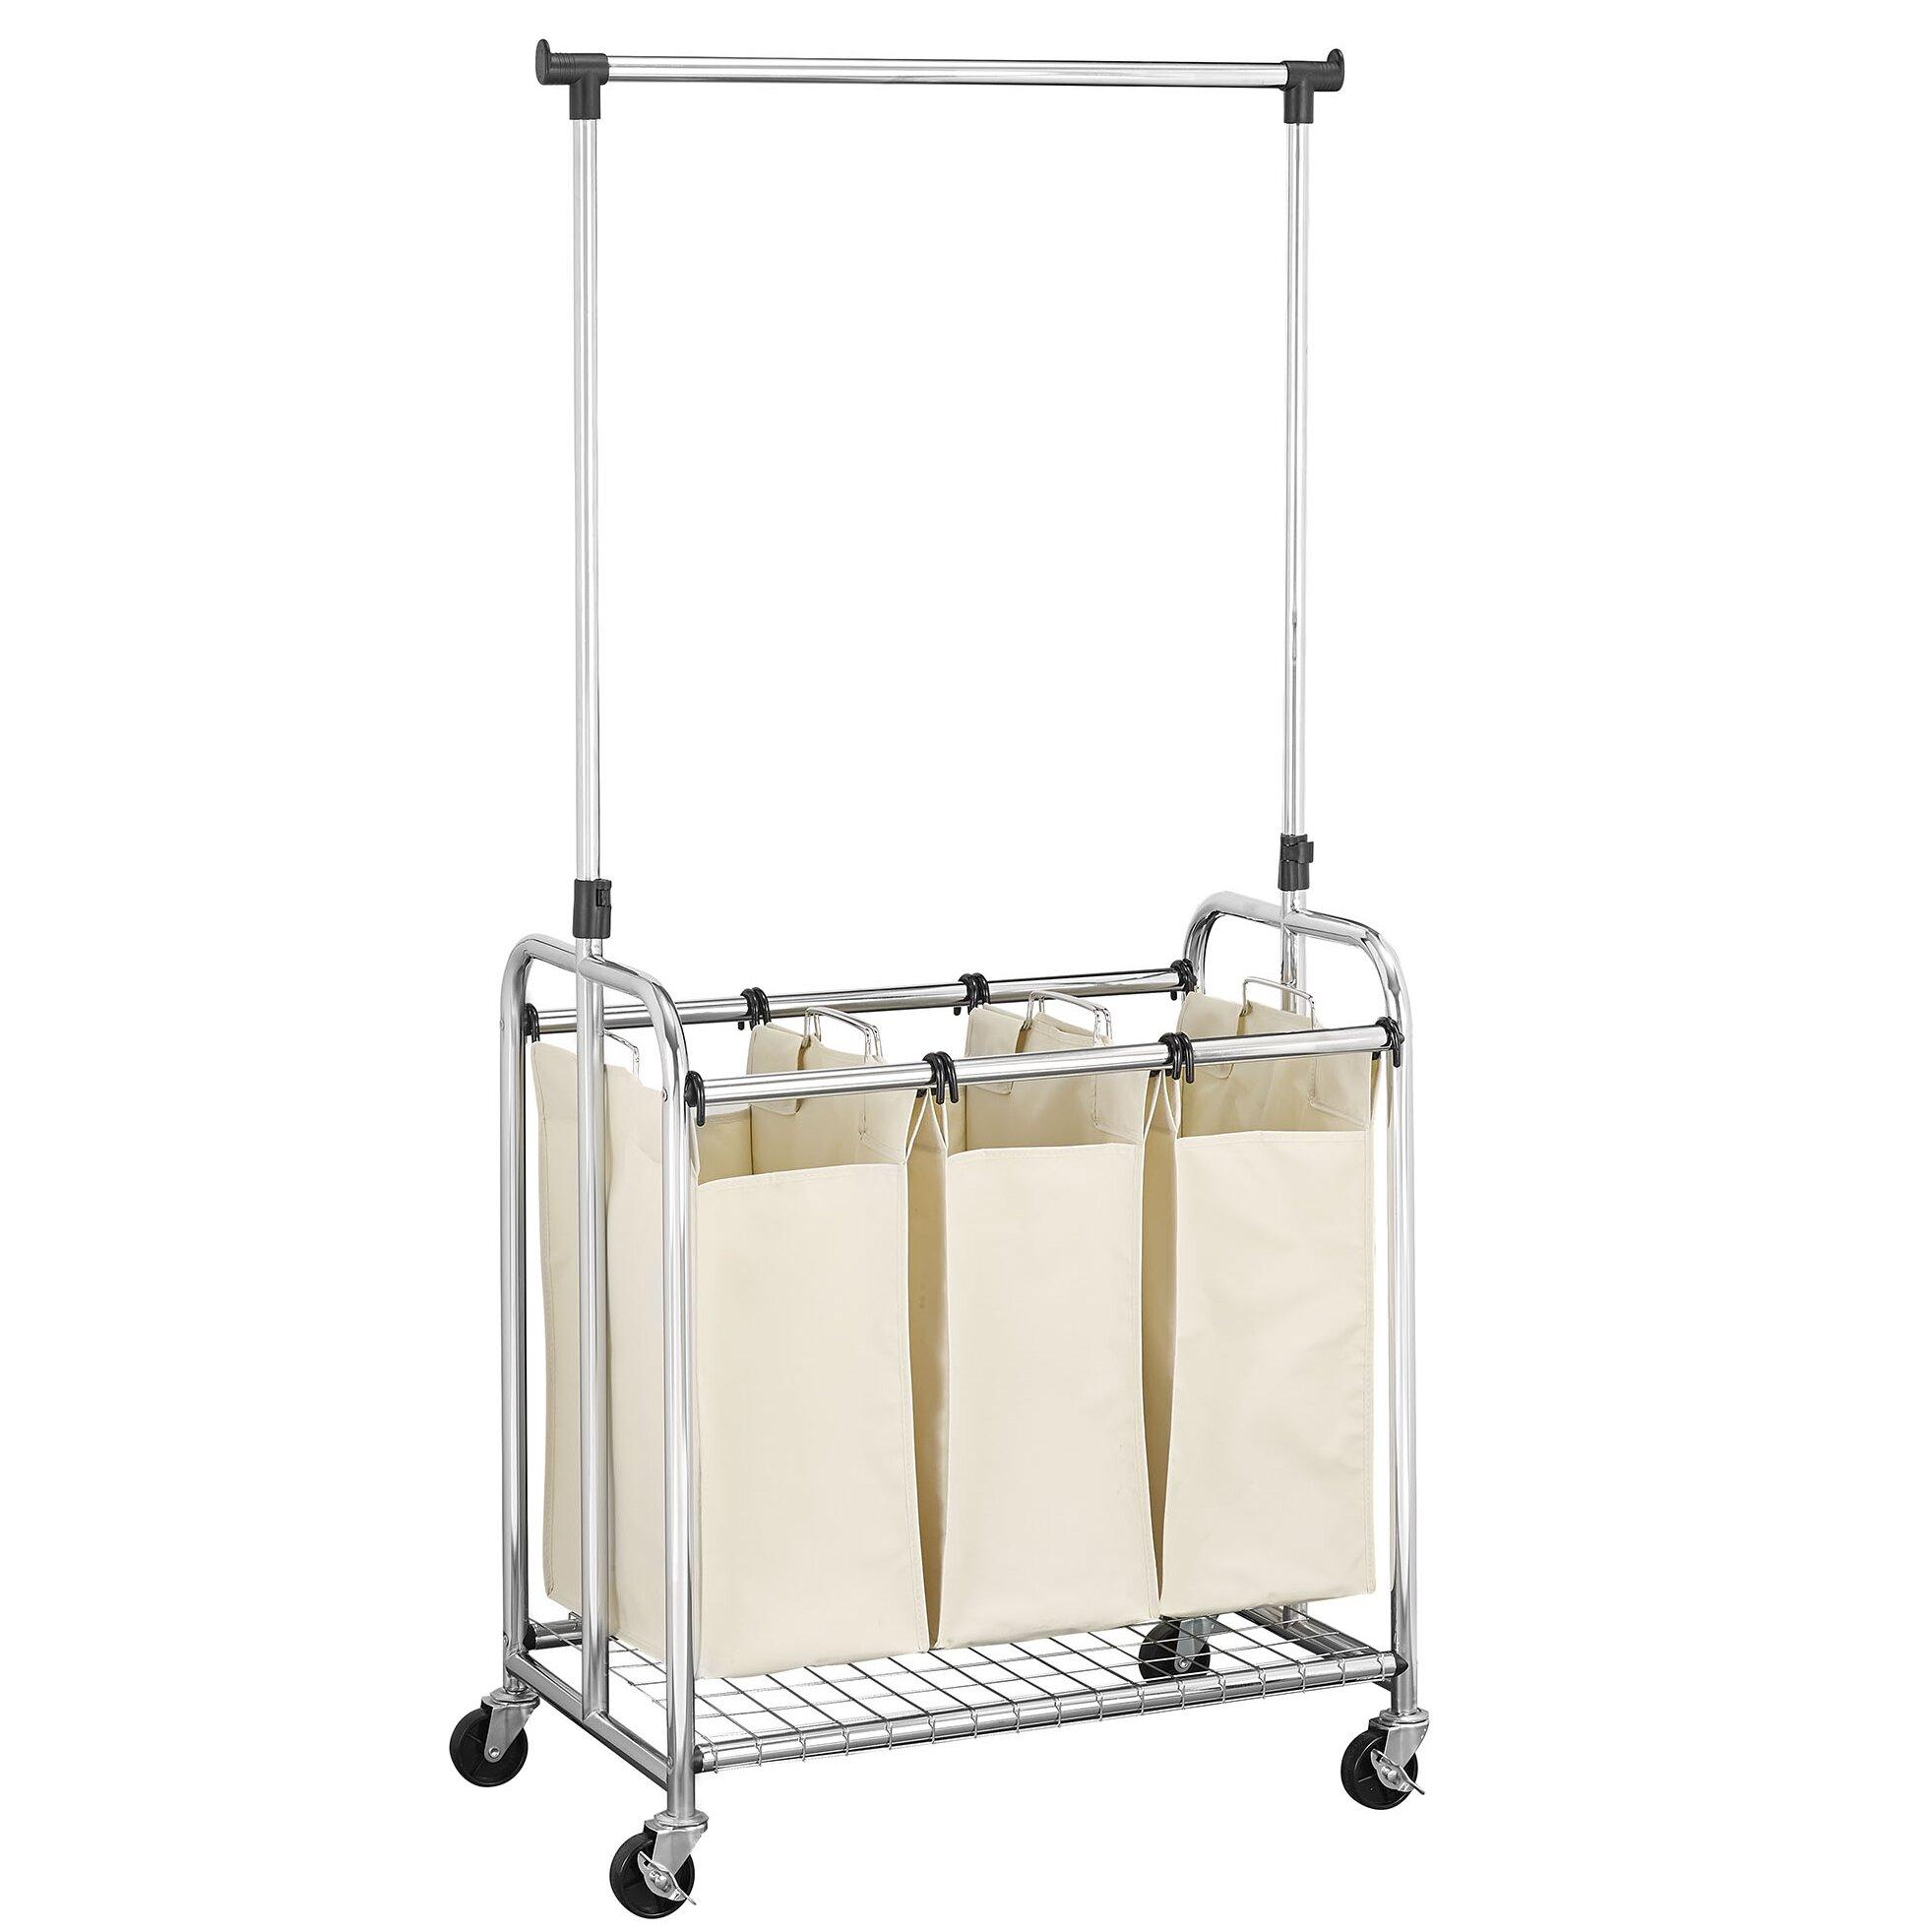 Household Essentials 3 Bag Laundry Sorter Wayfair